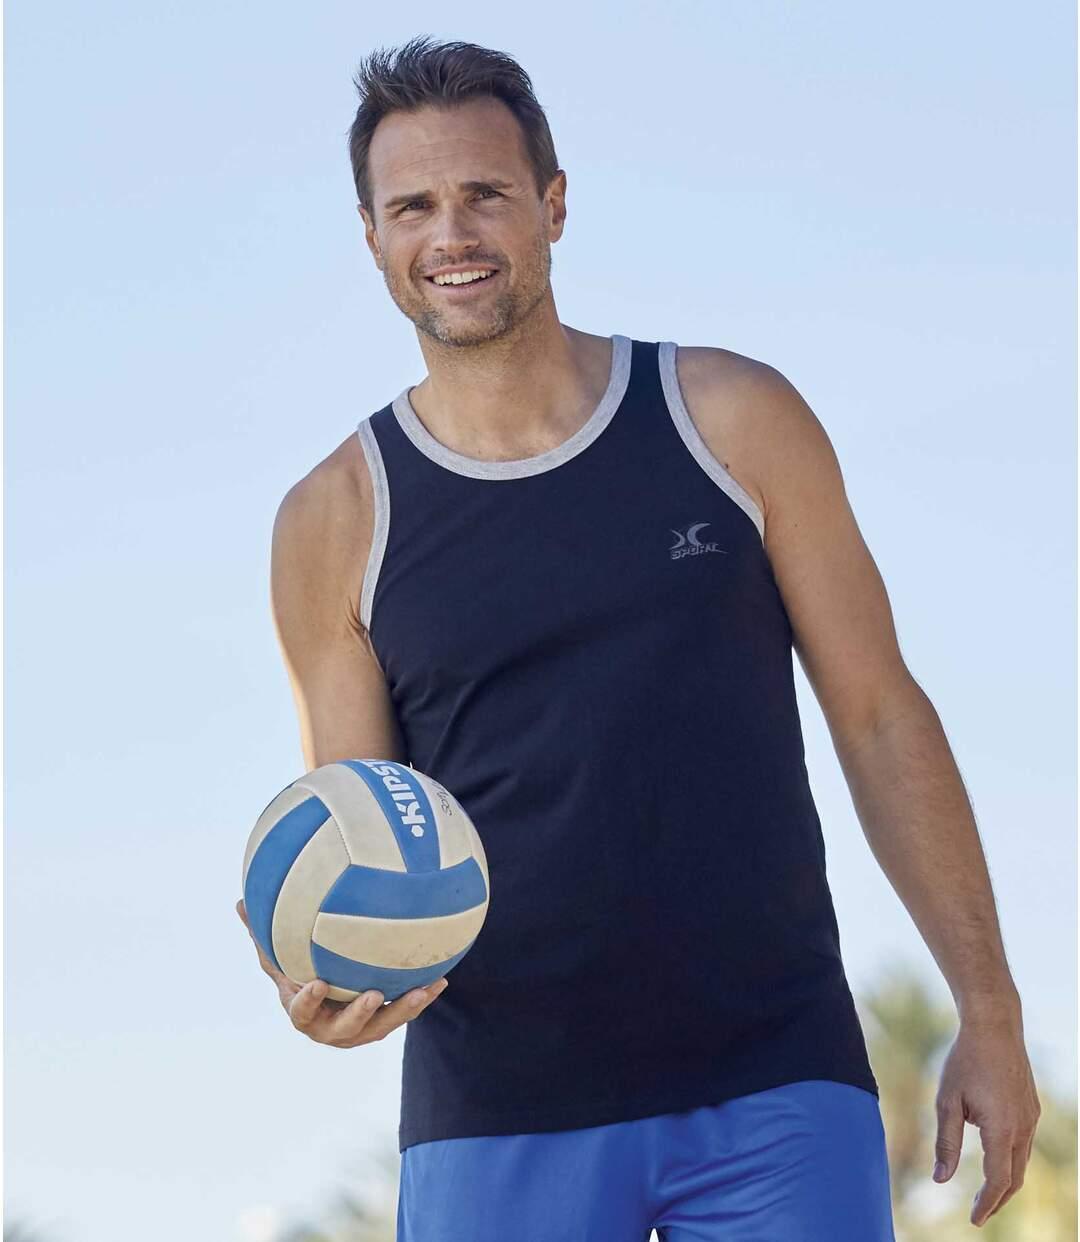 Pack of 3 Men's Basic Sports Vests - Black White Blue